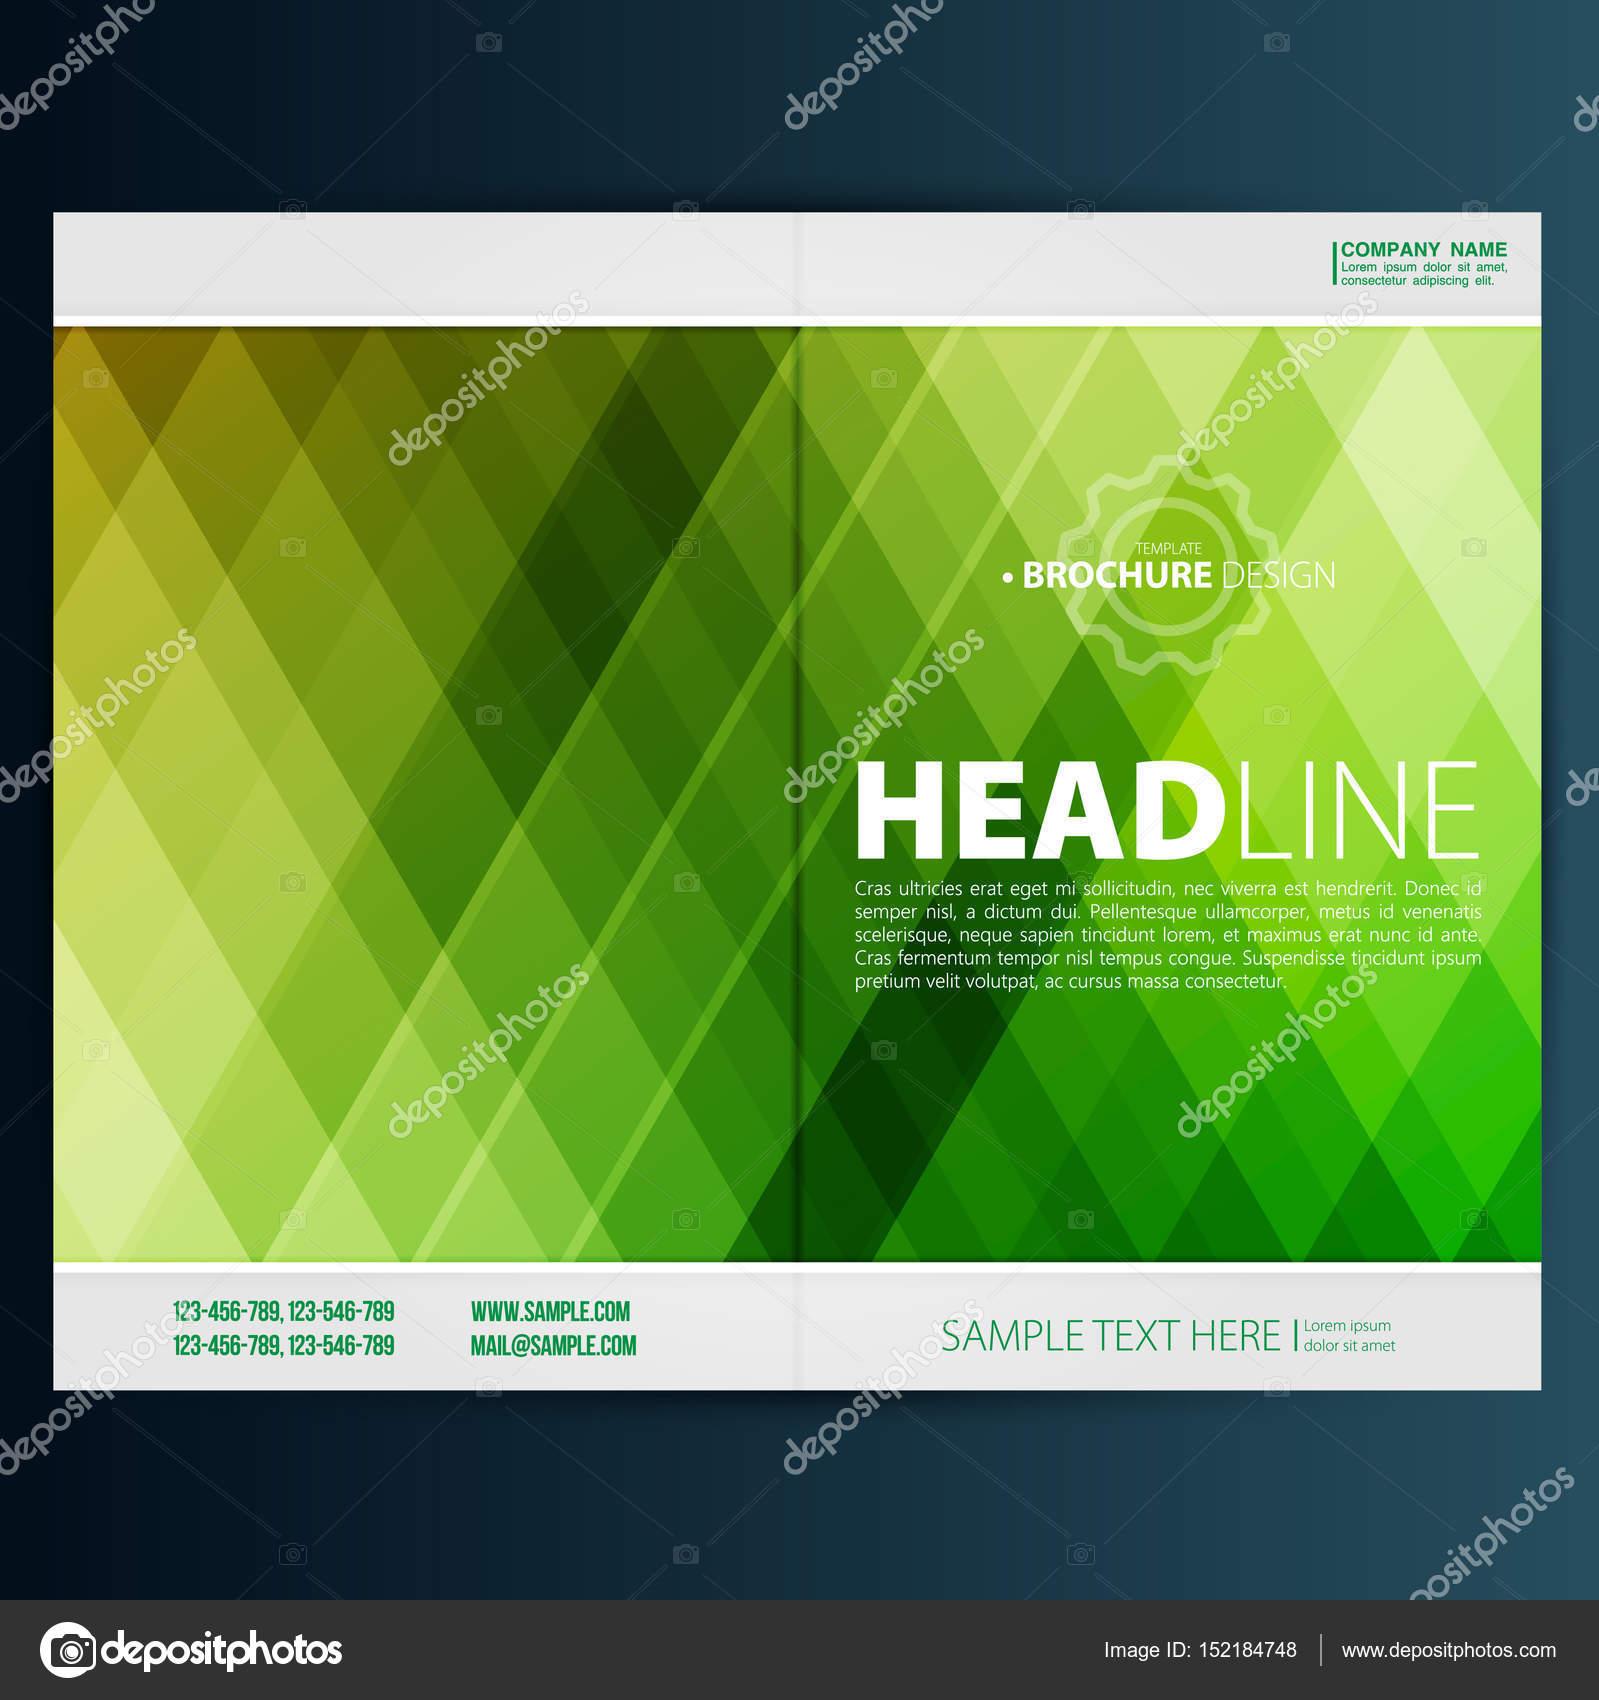 plantilla de diseño folleto flyer — Vector de stock © Mix3r #152184748